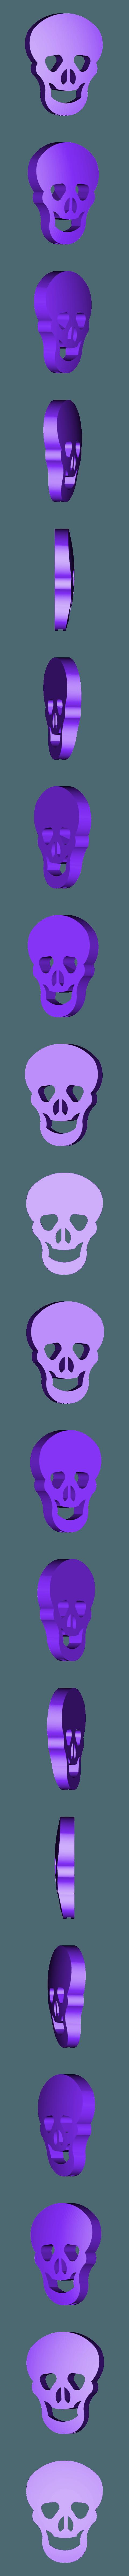 Skull.stl Download free STL file Visions of Halloween Danced In Her (His) Head, Motorized • 3D printing template, gzumwalt